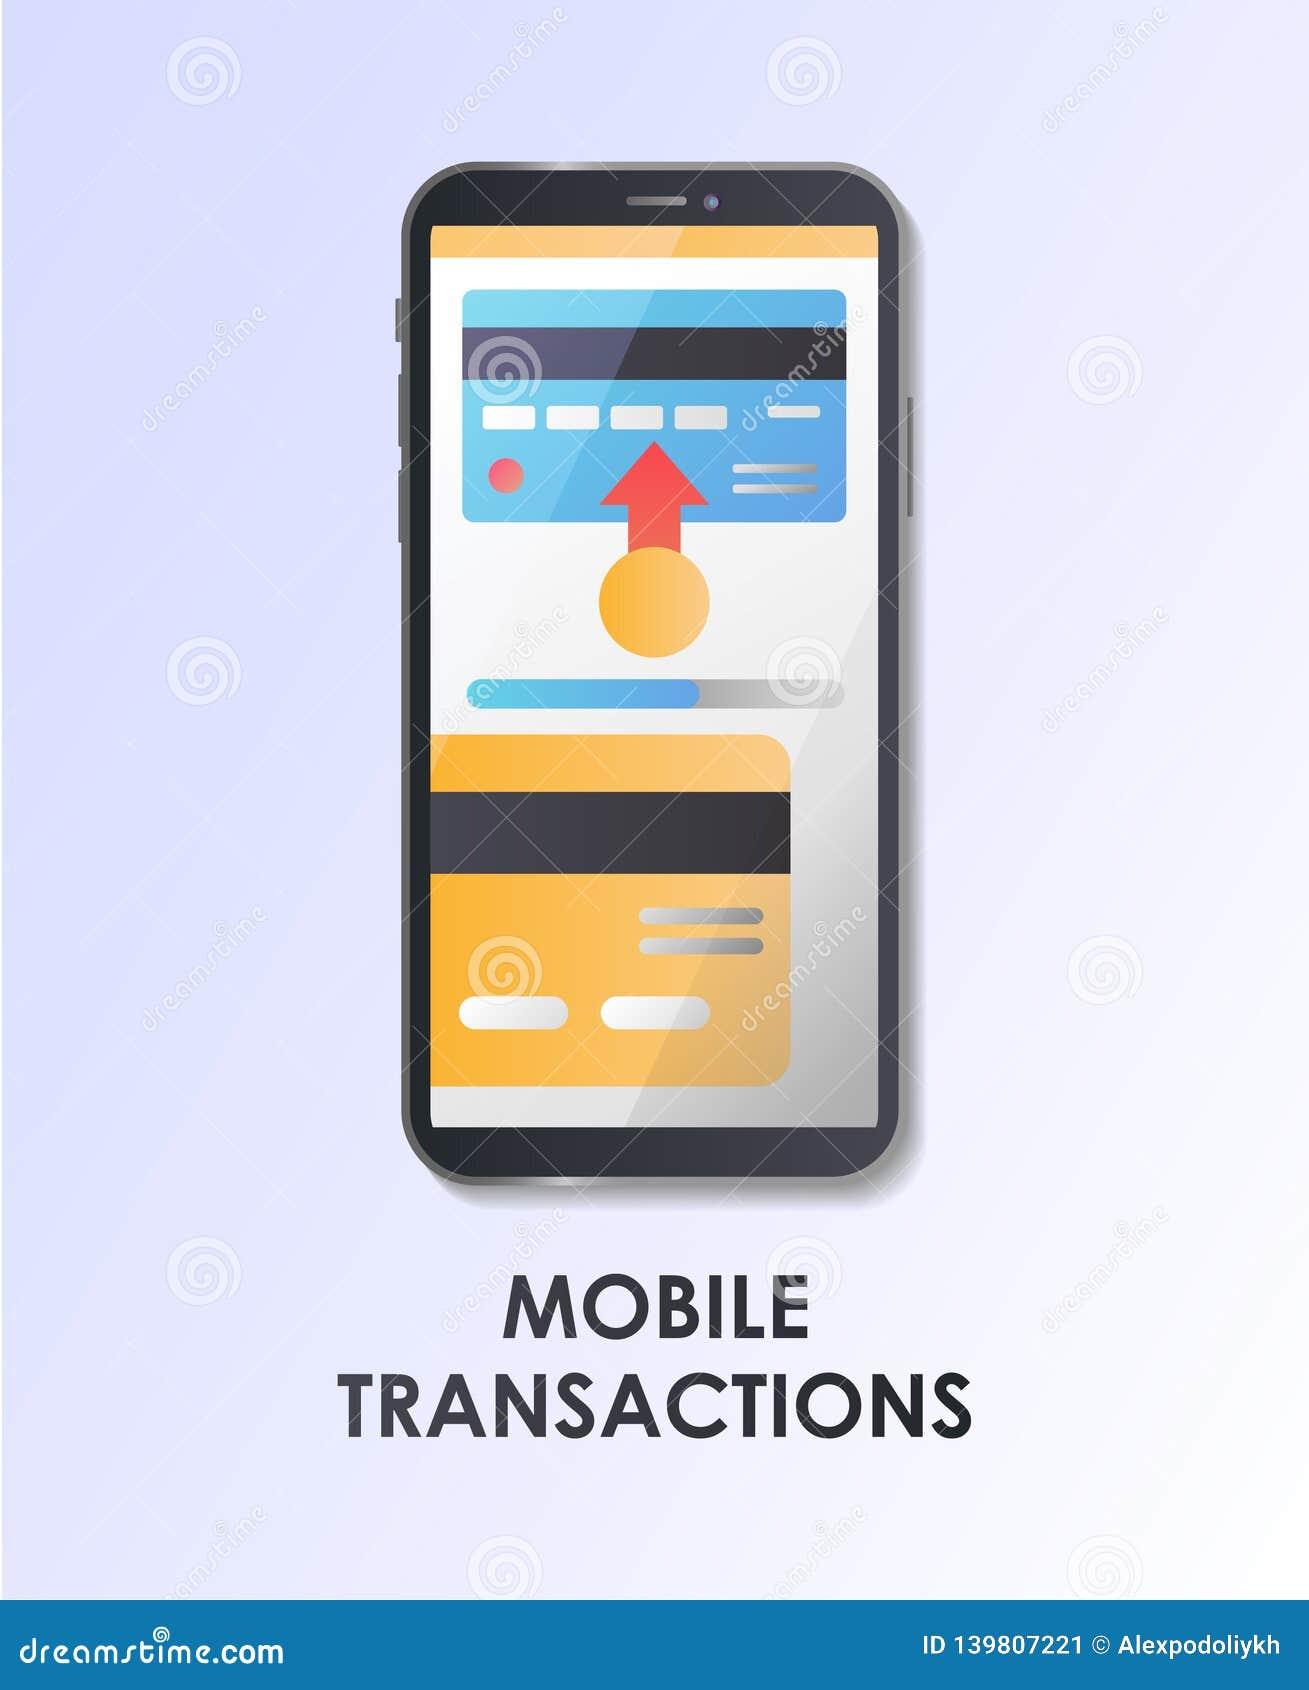 Mobile transaction. Payment. Flat vector illustration.